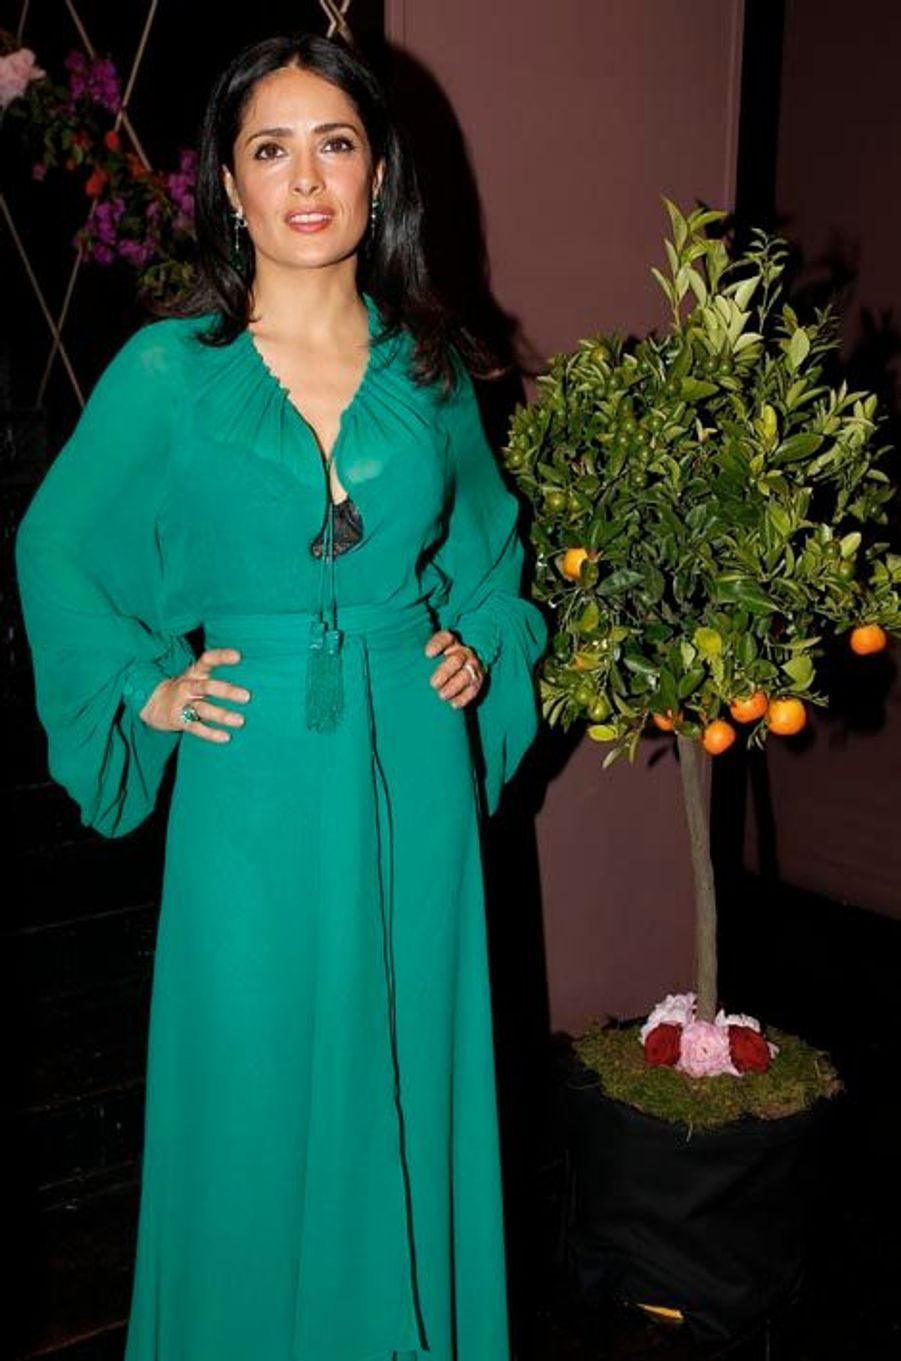 Gala. Salma Hayek adore les p'tits cracks